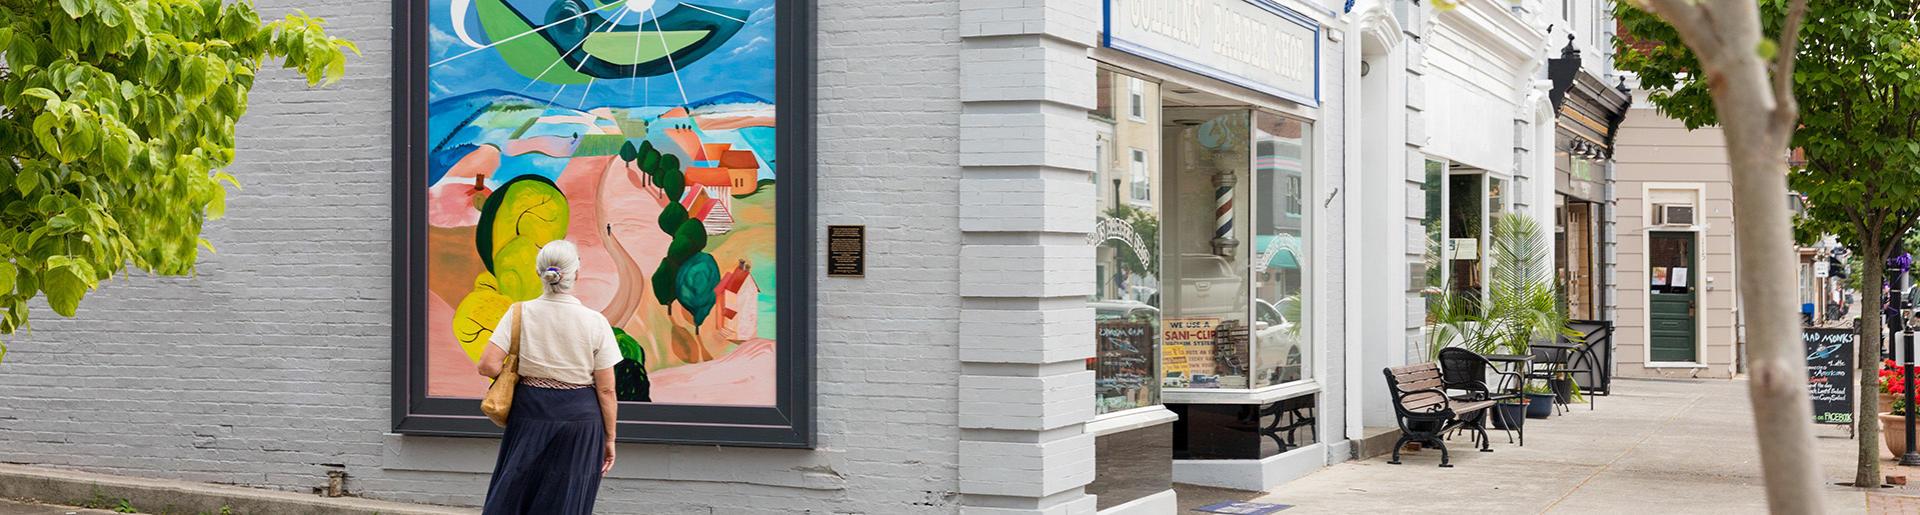 mural Charles Town